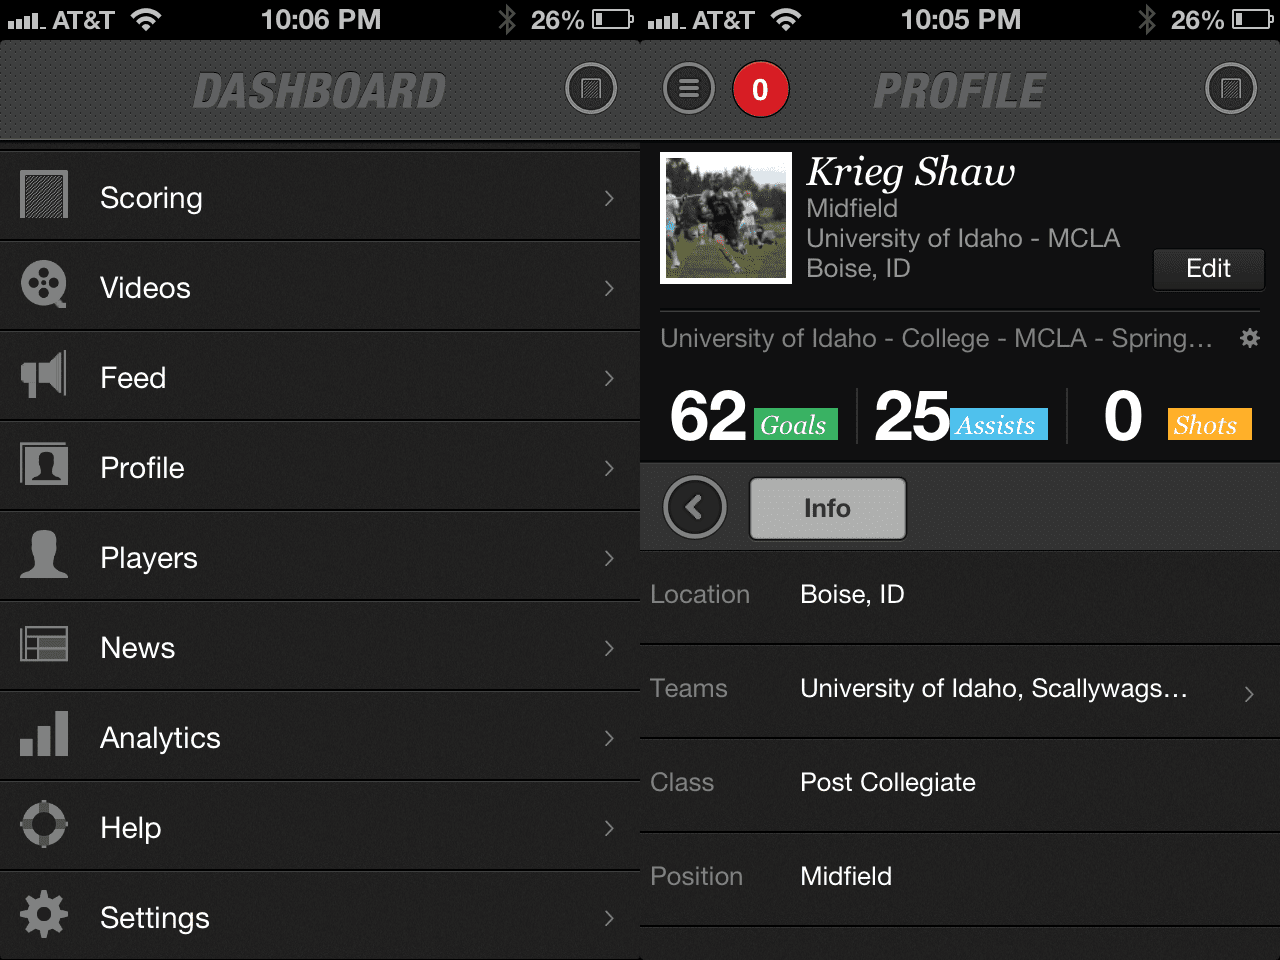 RipNet: Homes Screen & Profile